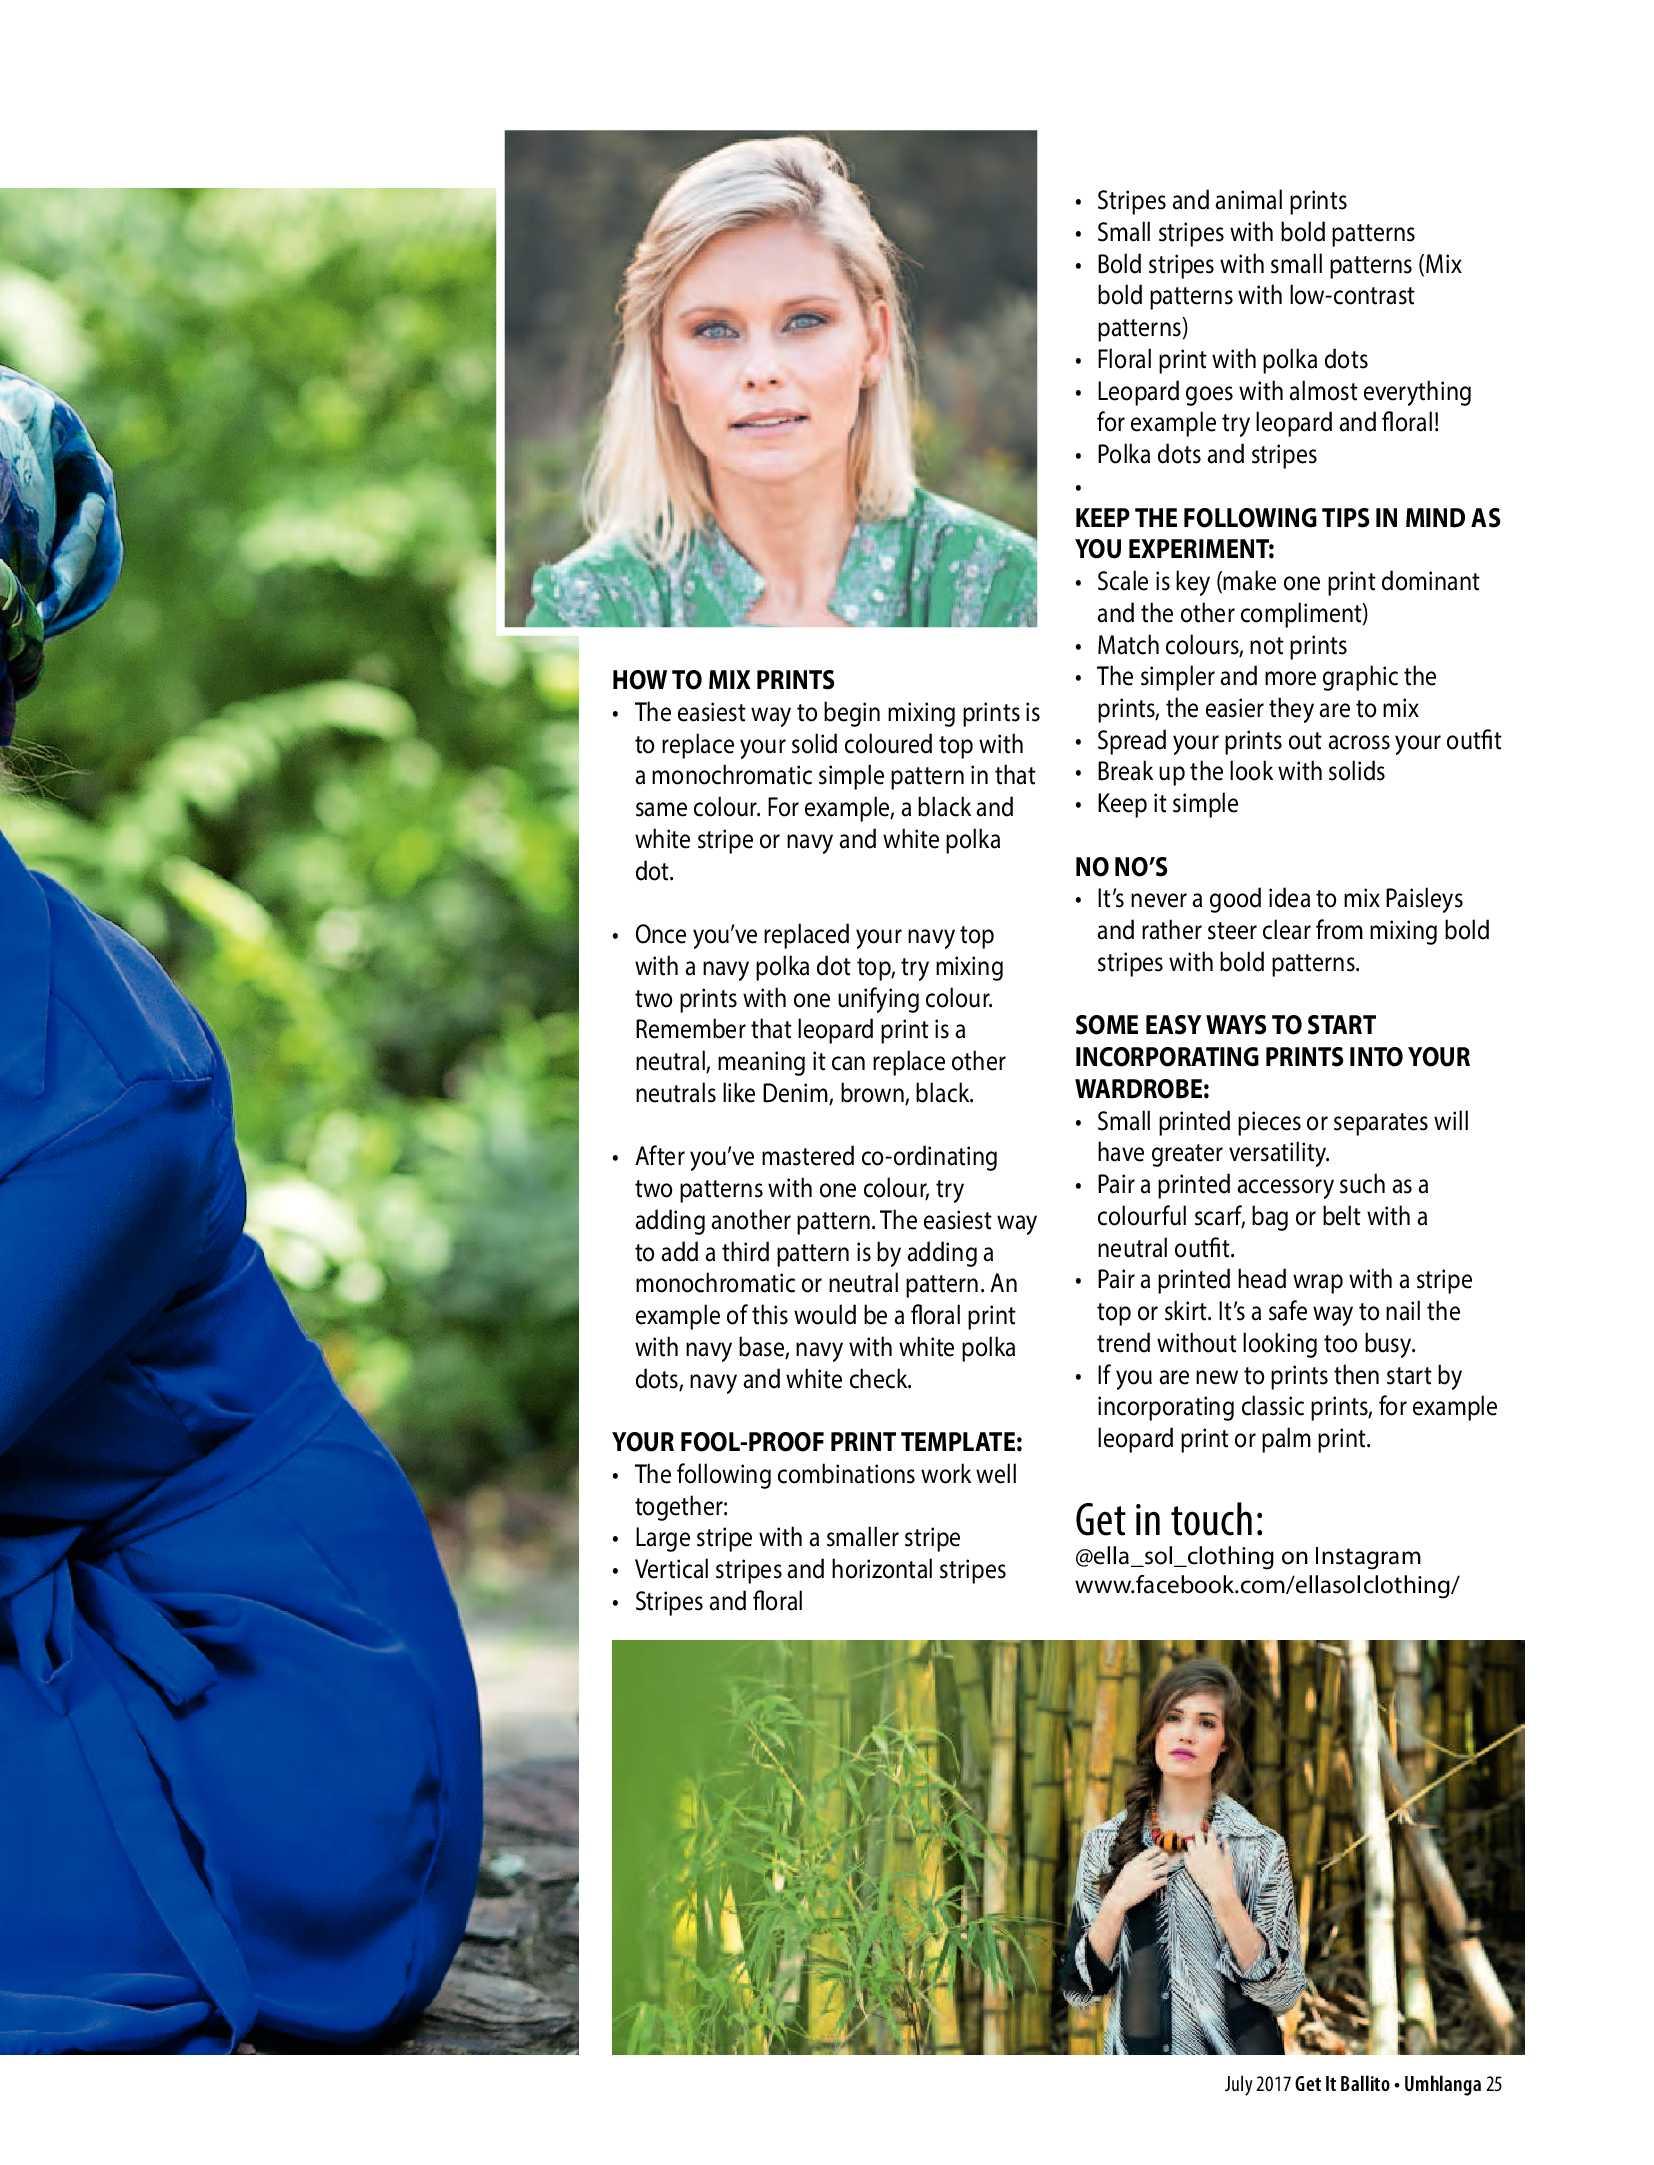 get-magazine-ballitoumhlanga-july-2017-2-epapers-page-27